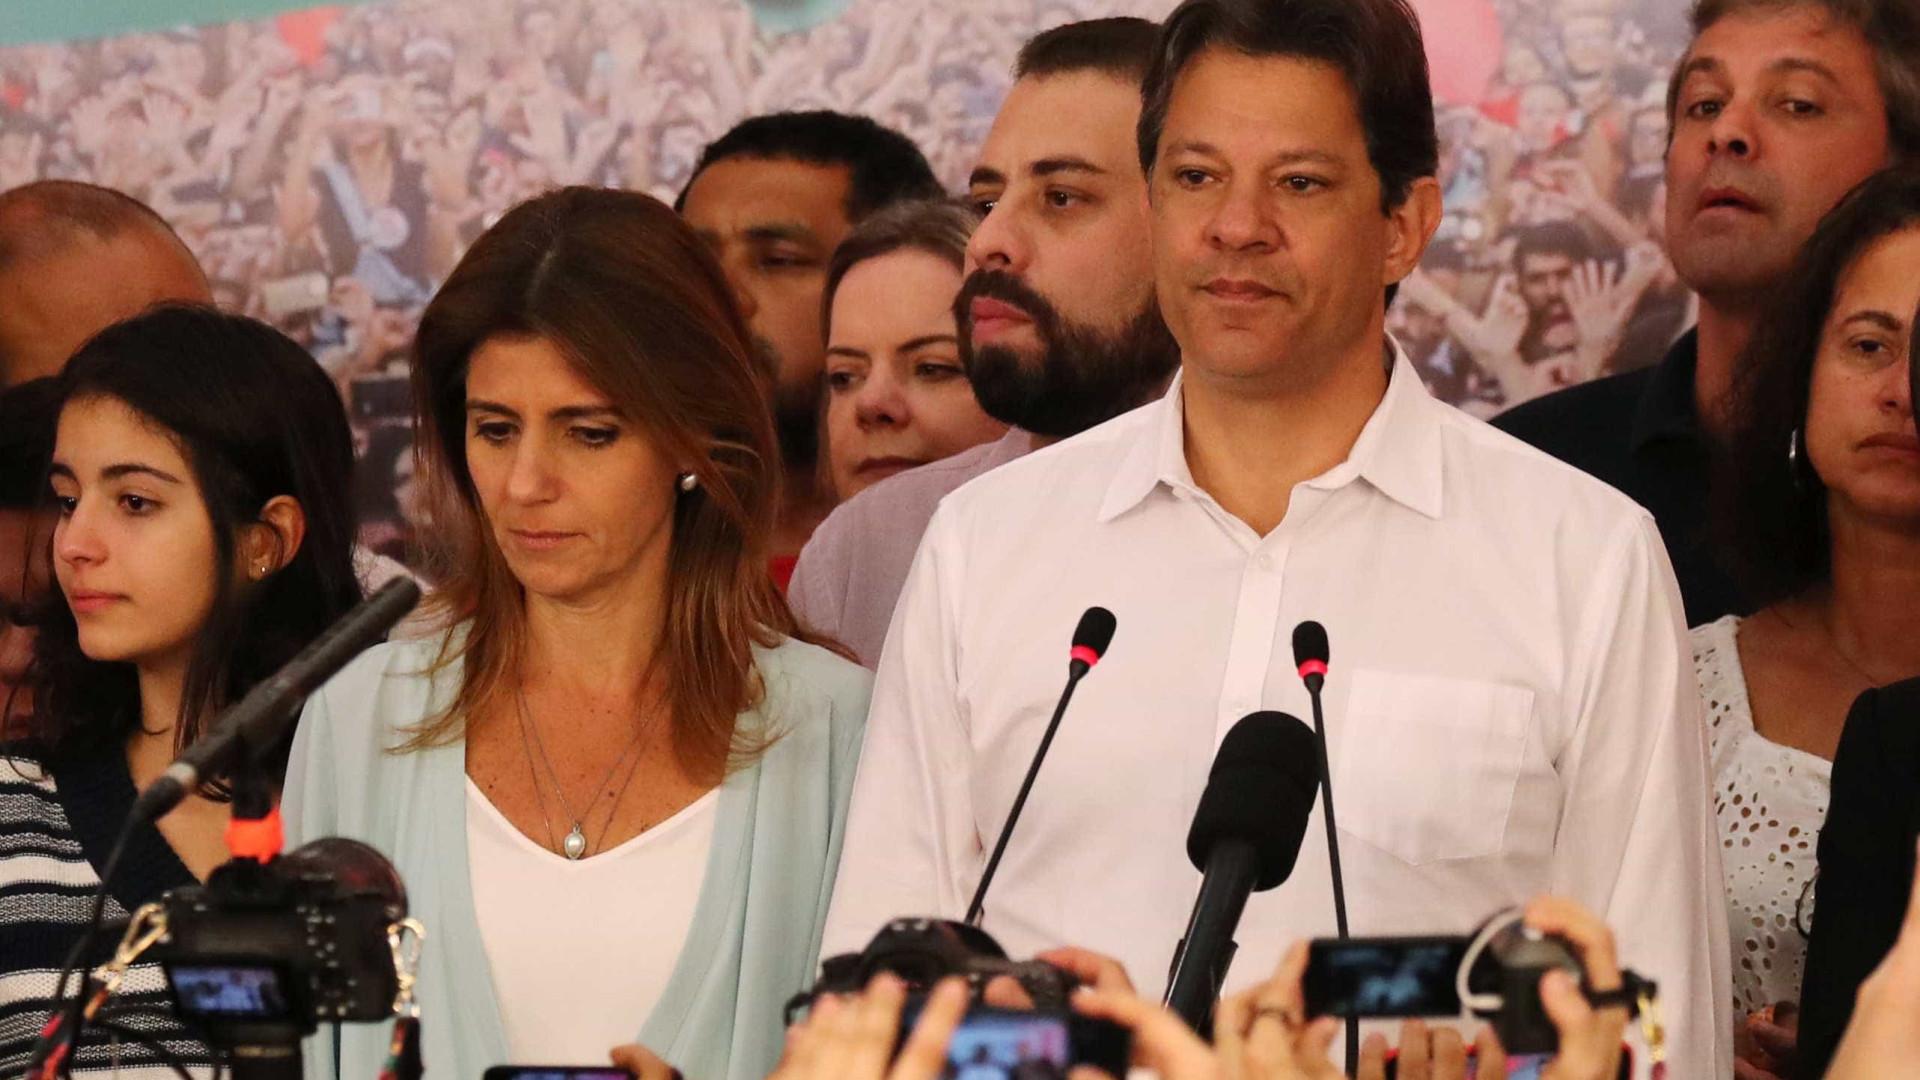 Haddad muda de ideia e parabeniza Bolsonaro: 'País merece o melhor'